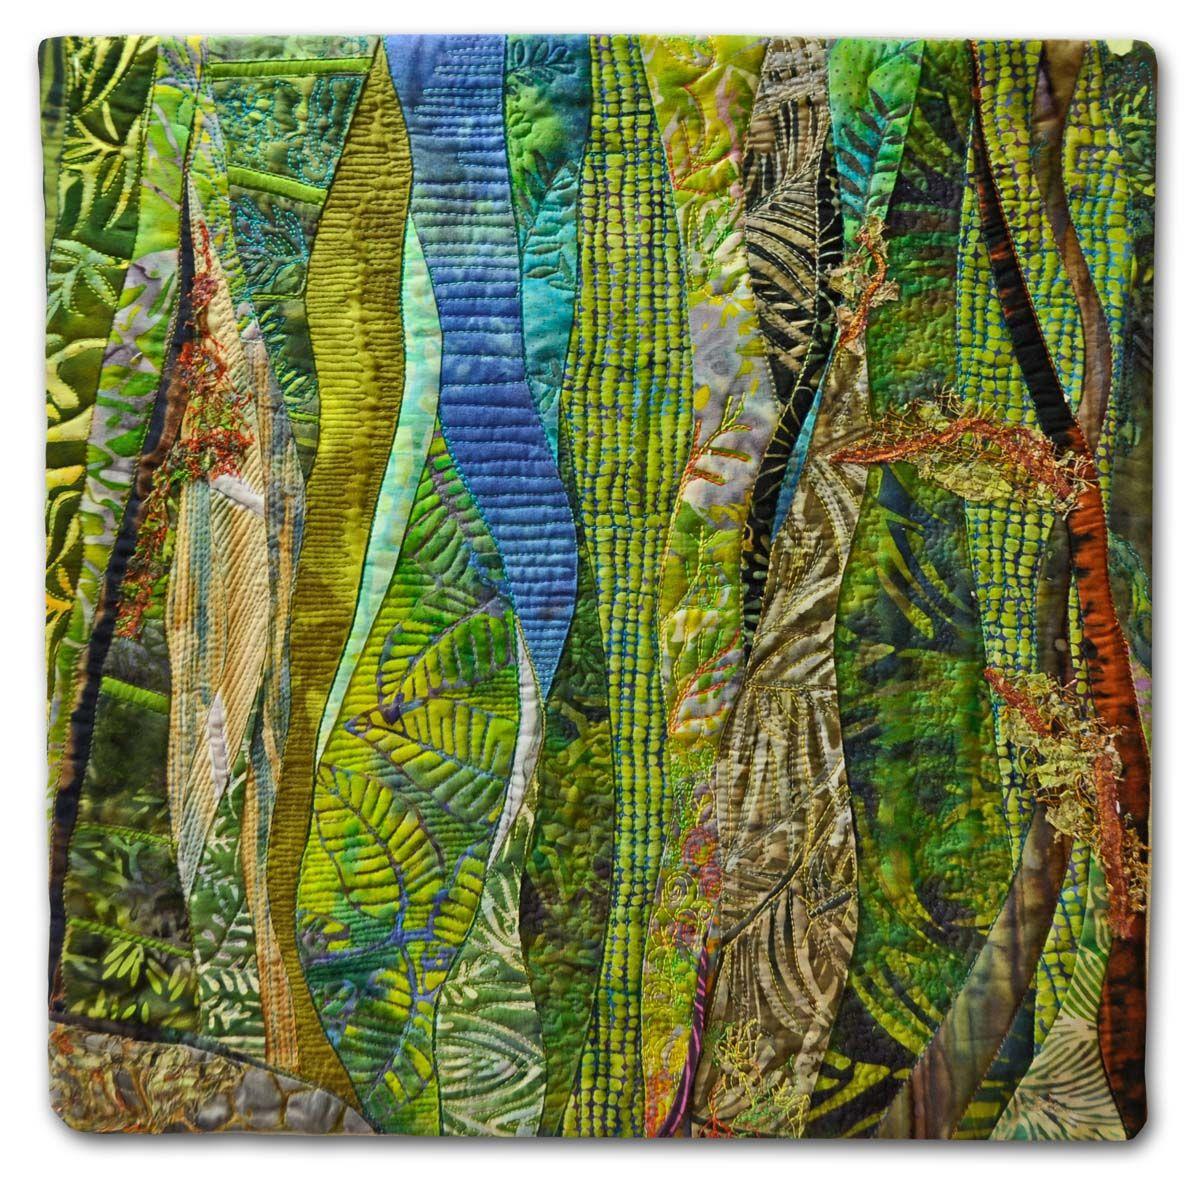 "Hilde Morin – Fiber art – SUMMER 15 W"" x 15″ H Curved piecing commercial fabrics…"